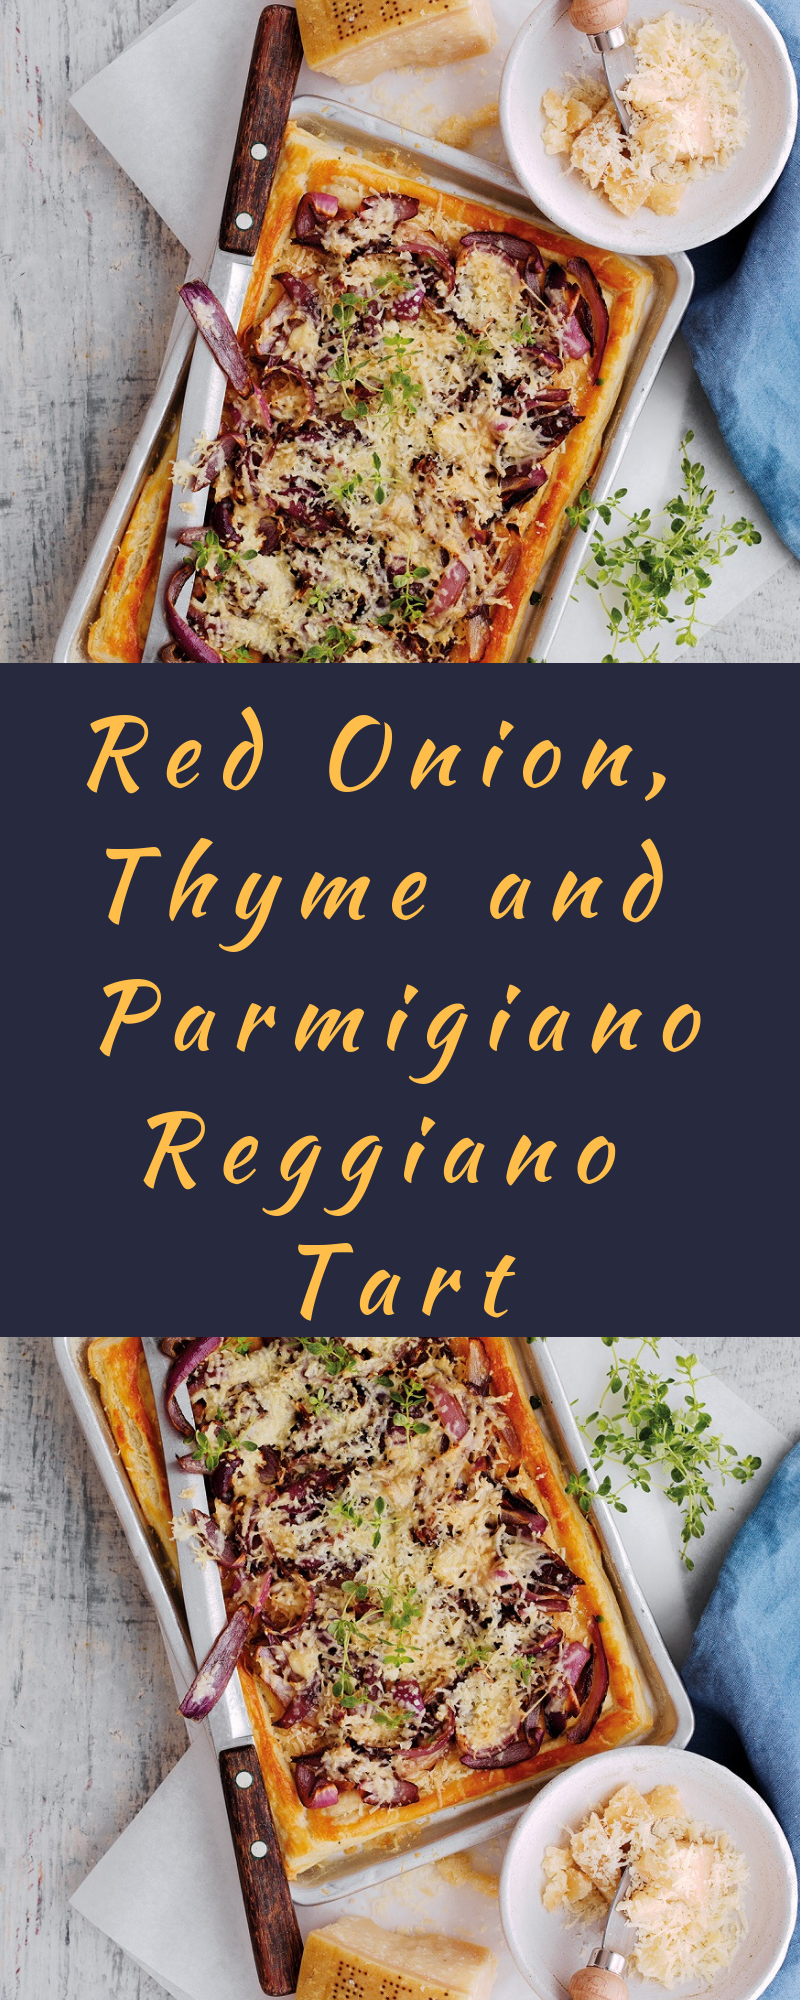 Parmigiano Reggiano, Barley, Butternut Squash And Pancetta Risotto